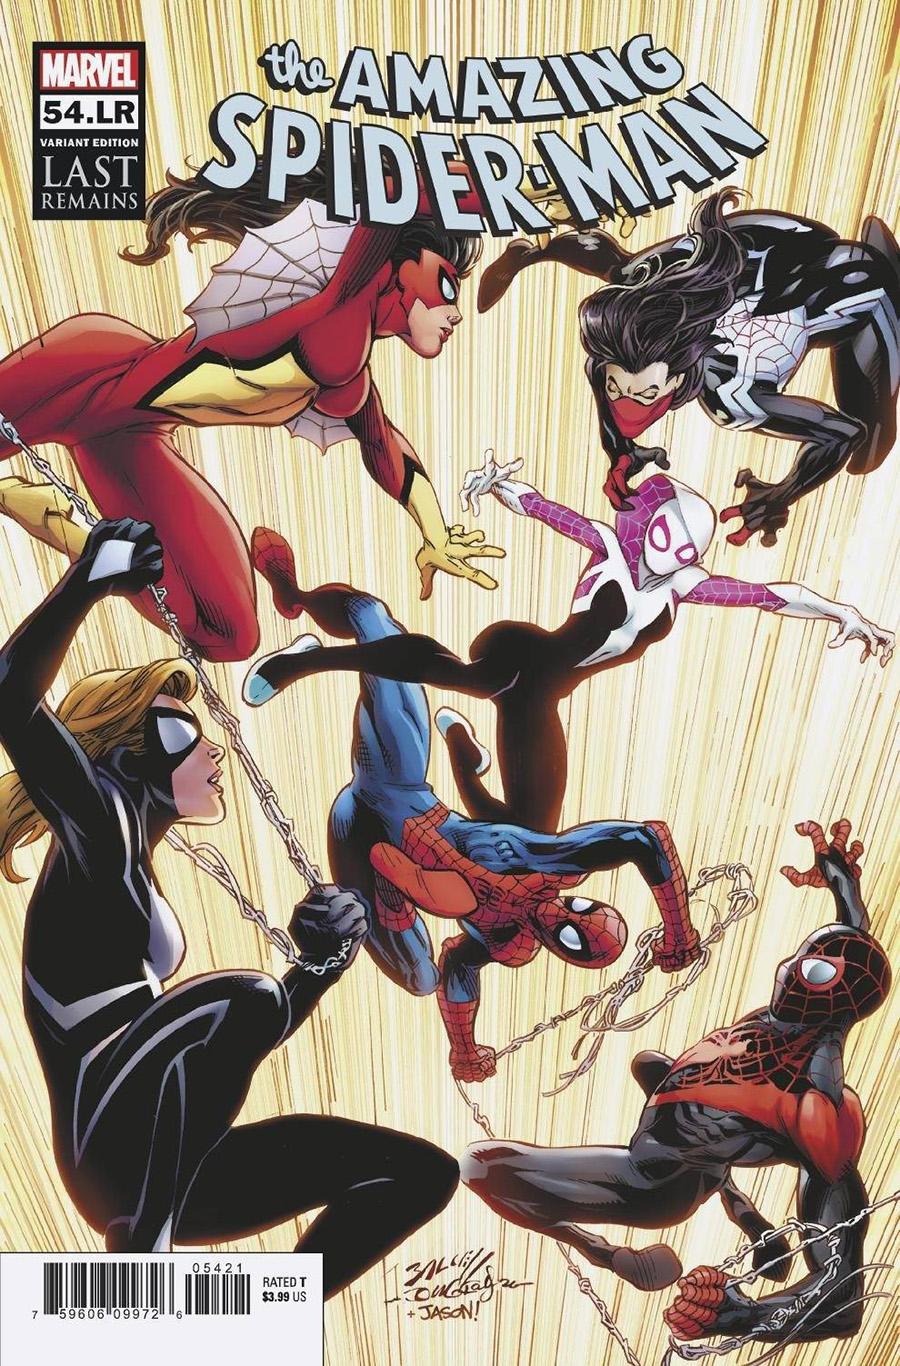 Amazing Spider-Man Vol 5 #54 LR Cover B Variant Mark Bagley Cover